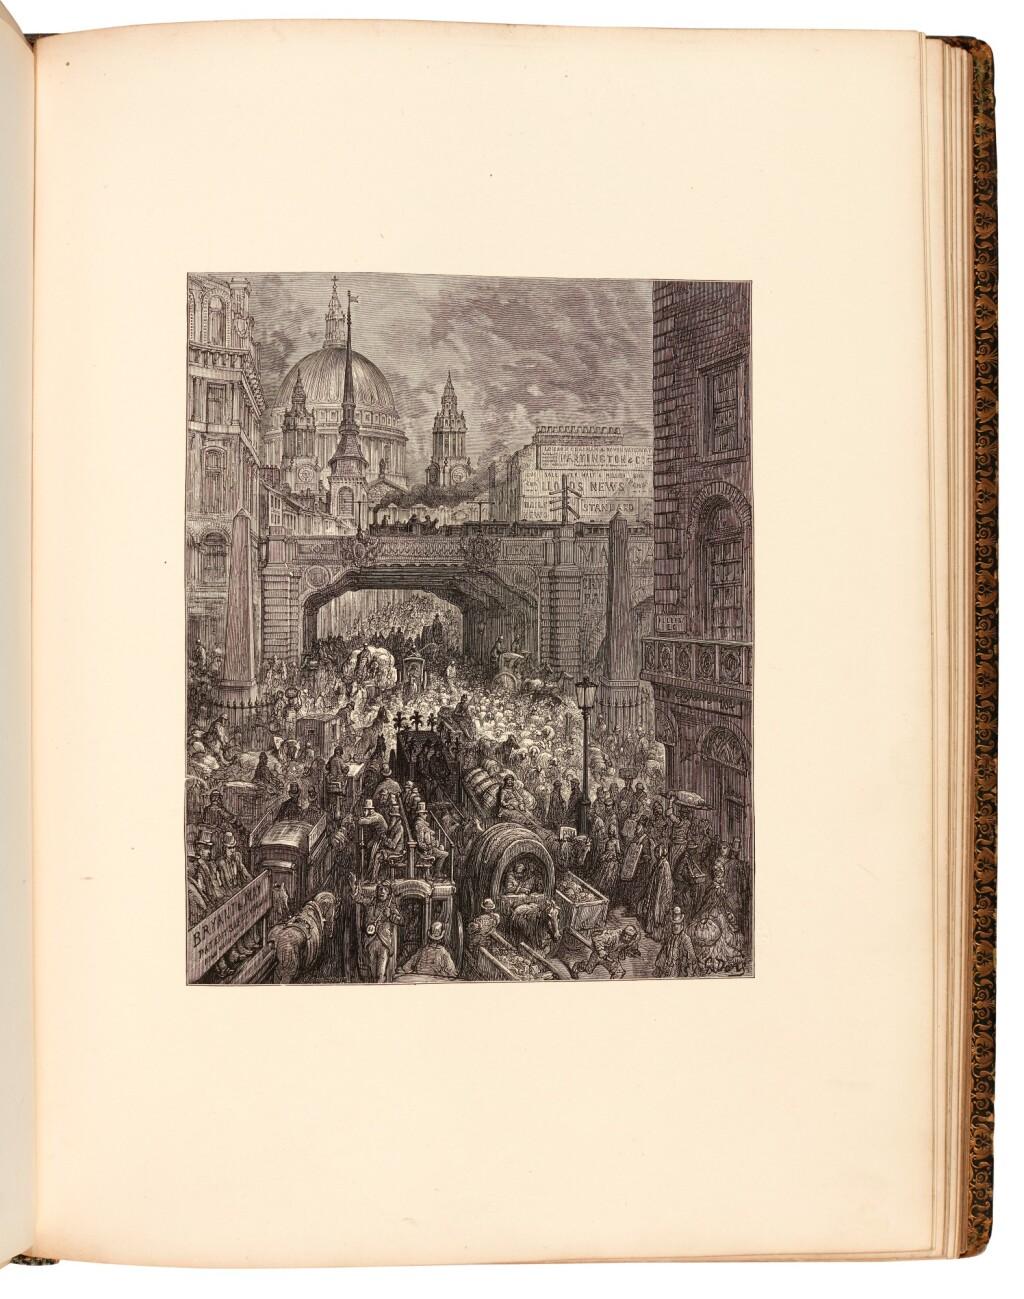 DORÉ, GUSTAVE AND BLANCHARD JERROLD | LONDON, A PILGRIMAGE. LONDON: GRANT & CO., 1872